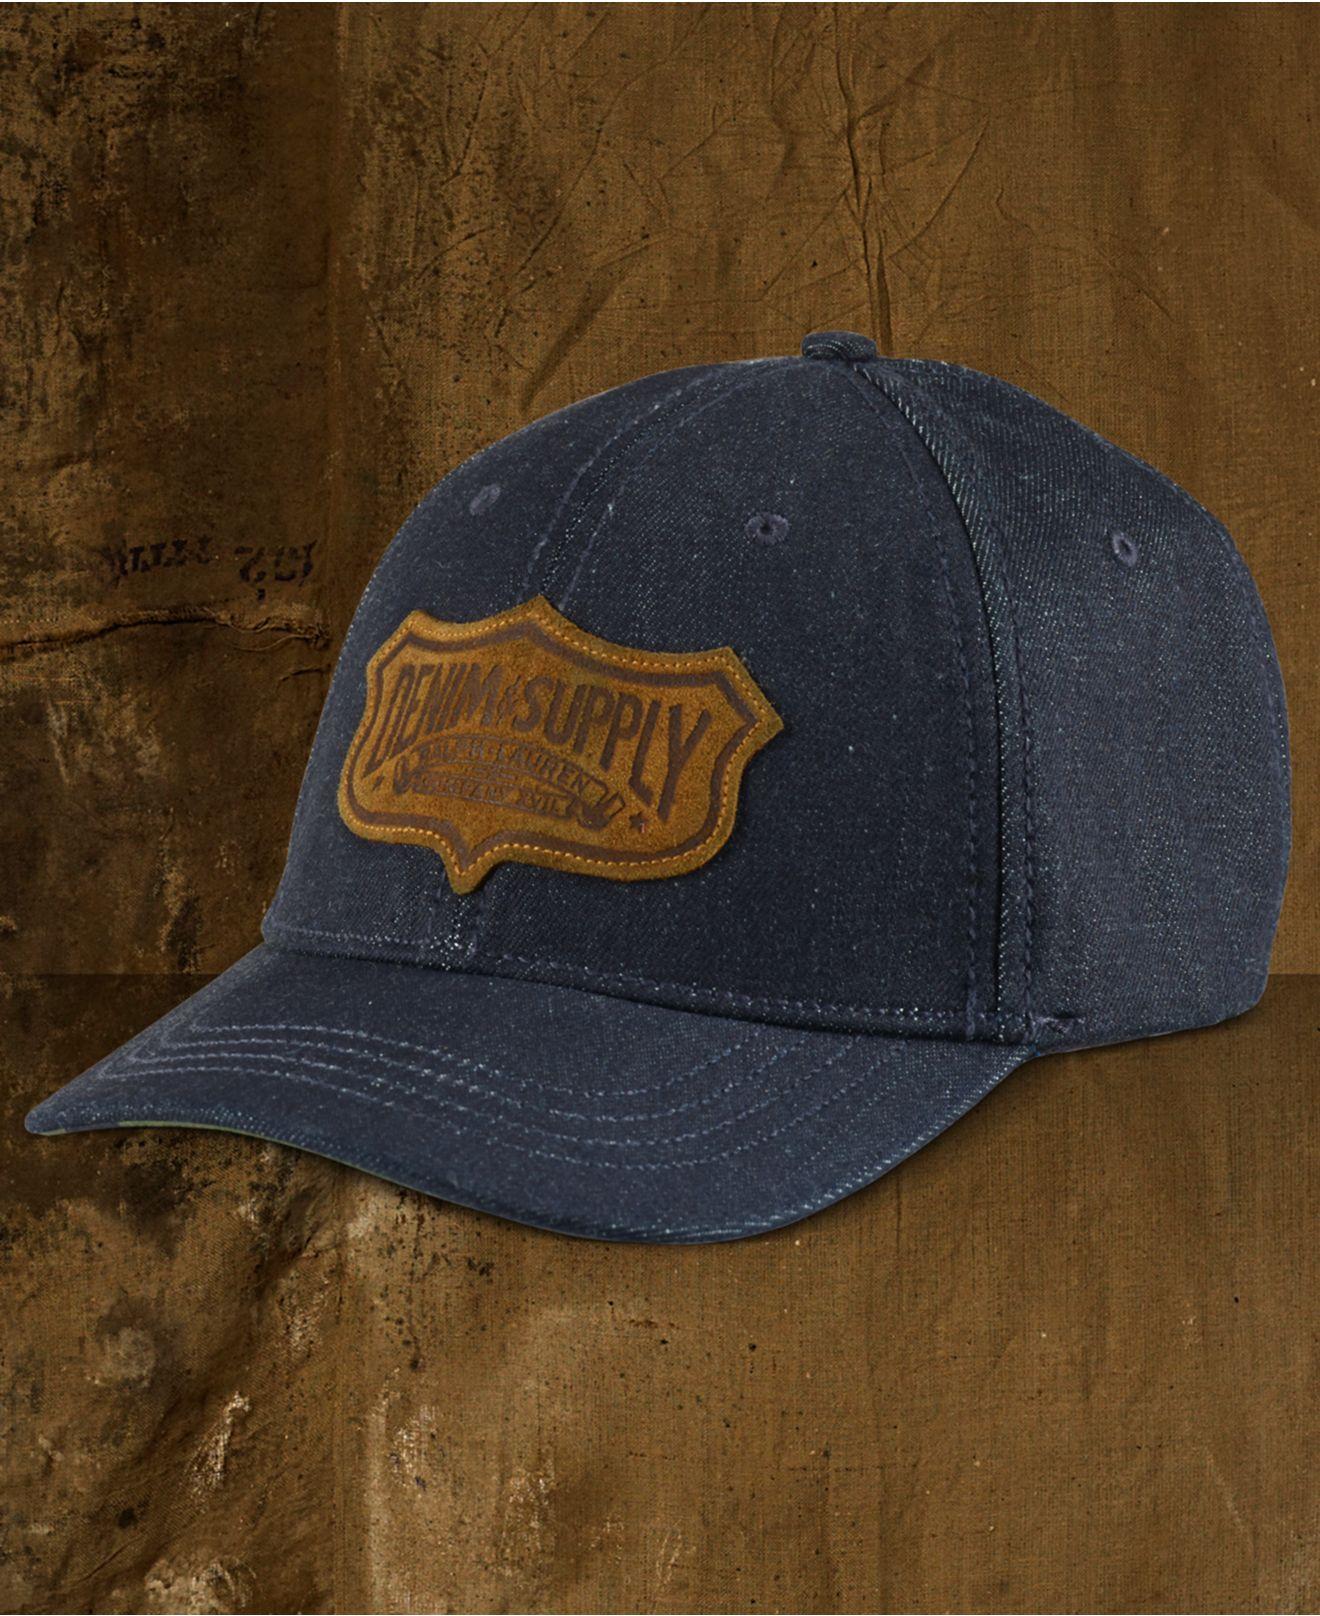 81eb92b8f1e Lyst - Denim   Supply Ralph Lauren Men s Denim Baseball Cap in Blue ...